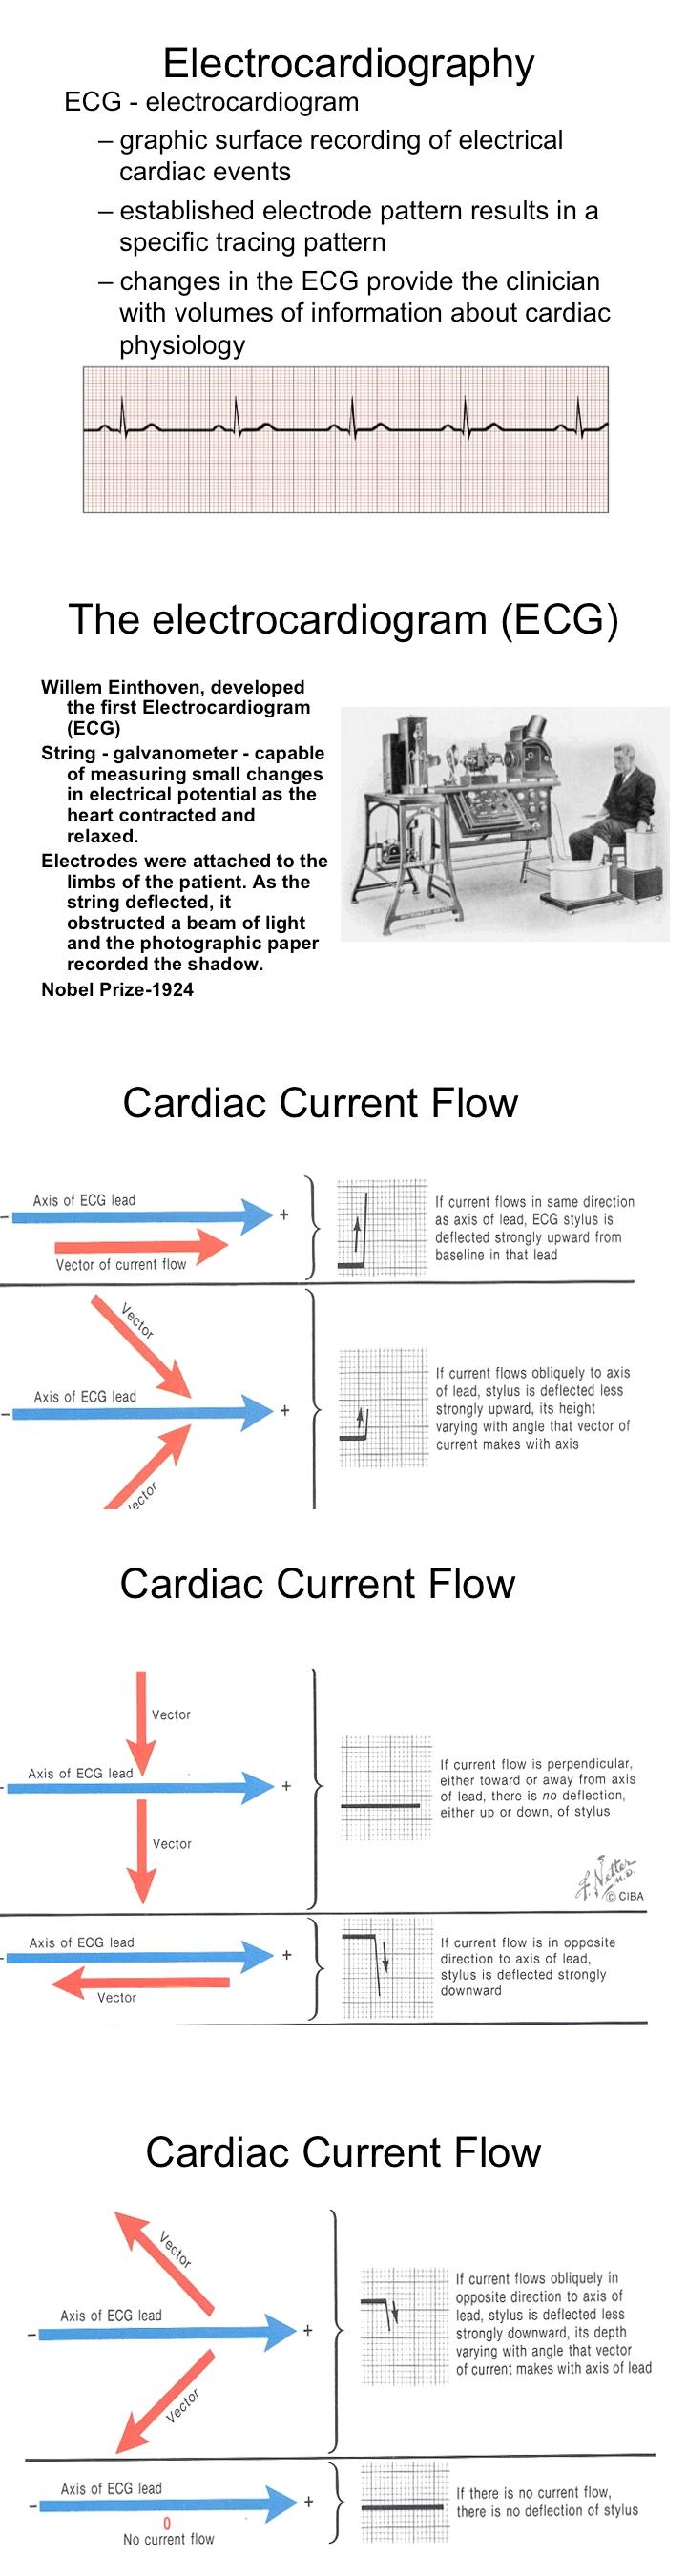 electrocardiology